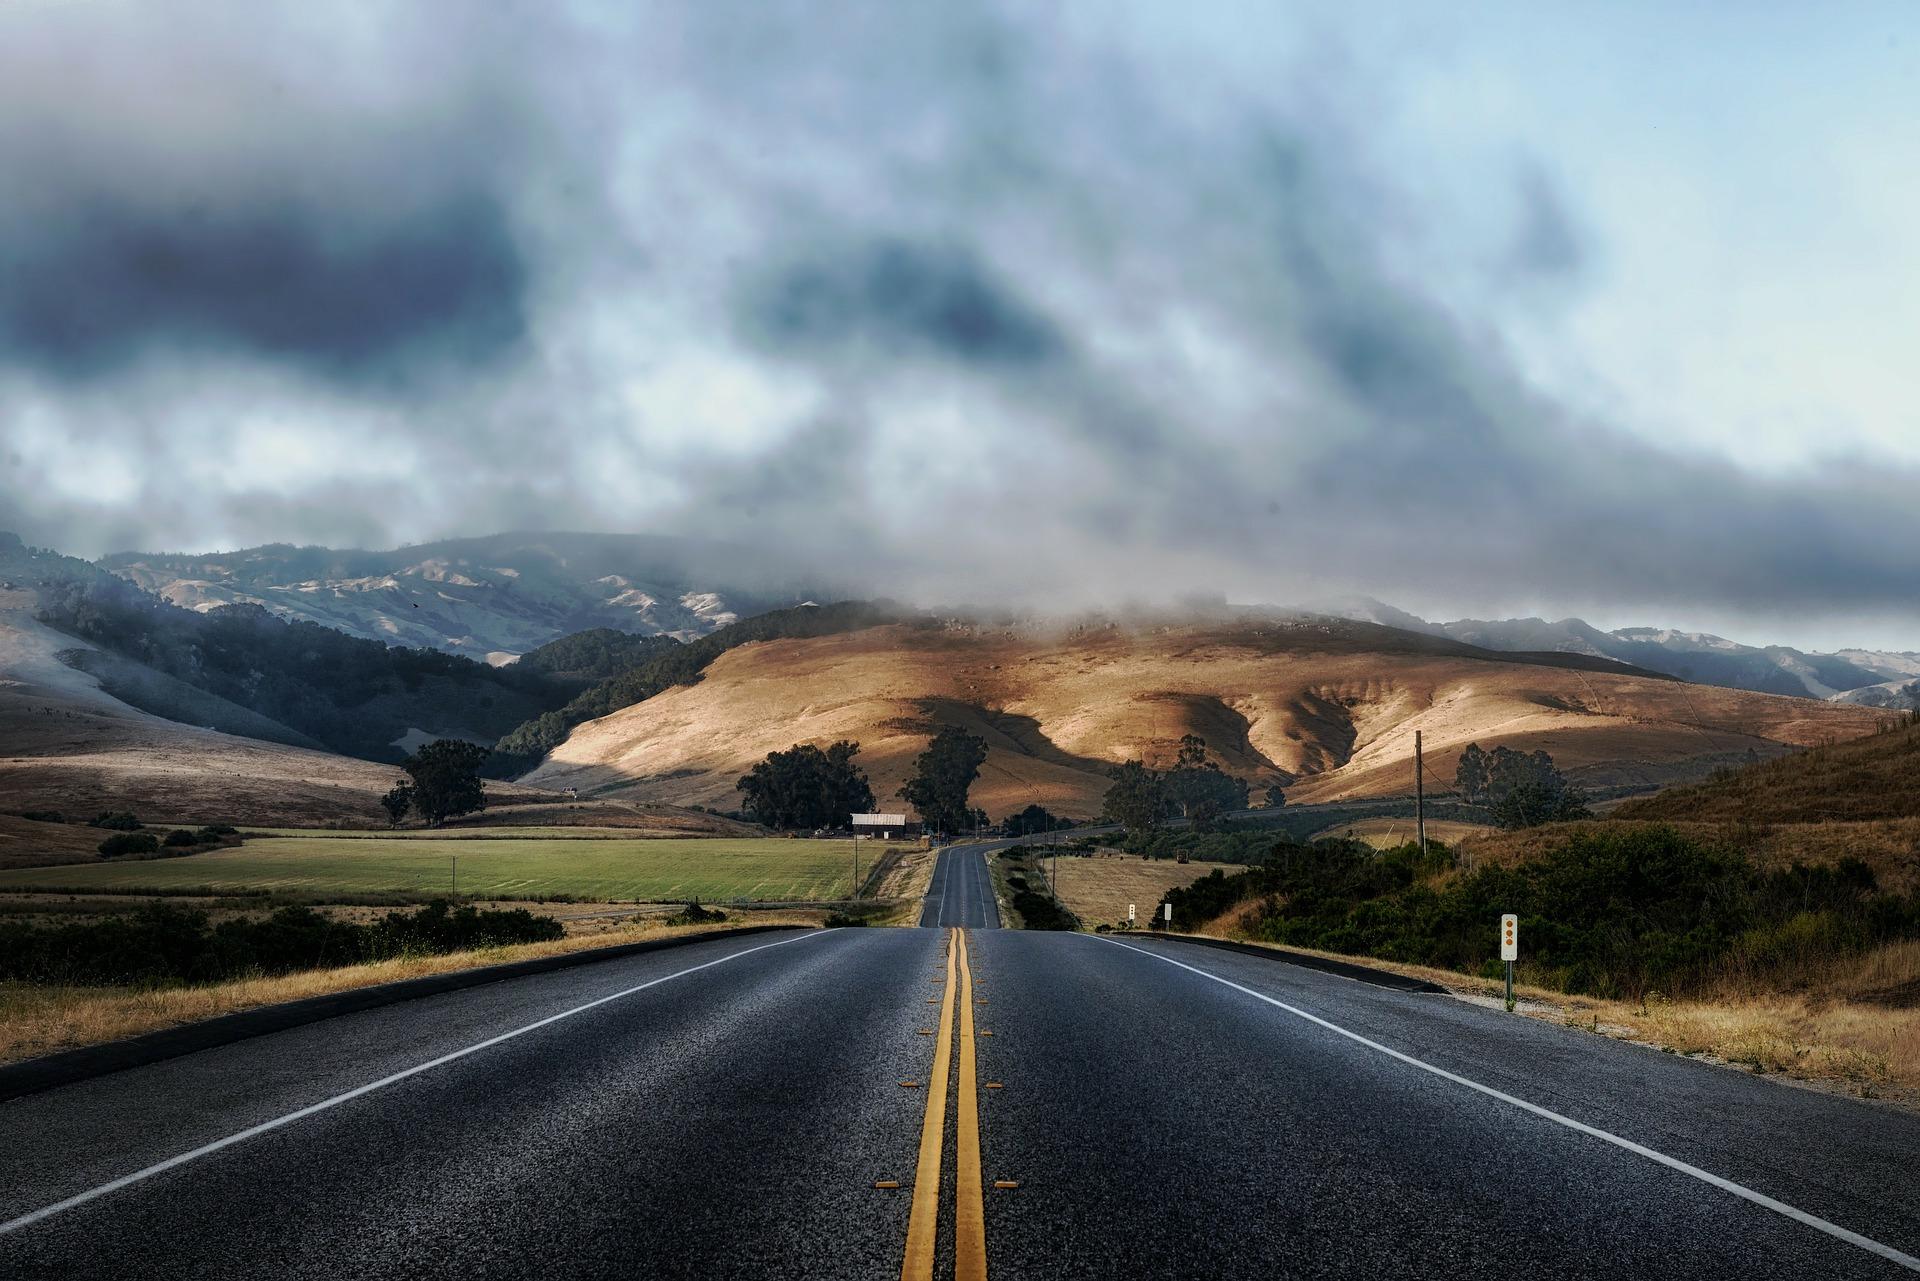 california-210913_1920.jpg